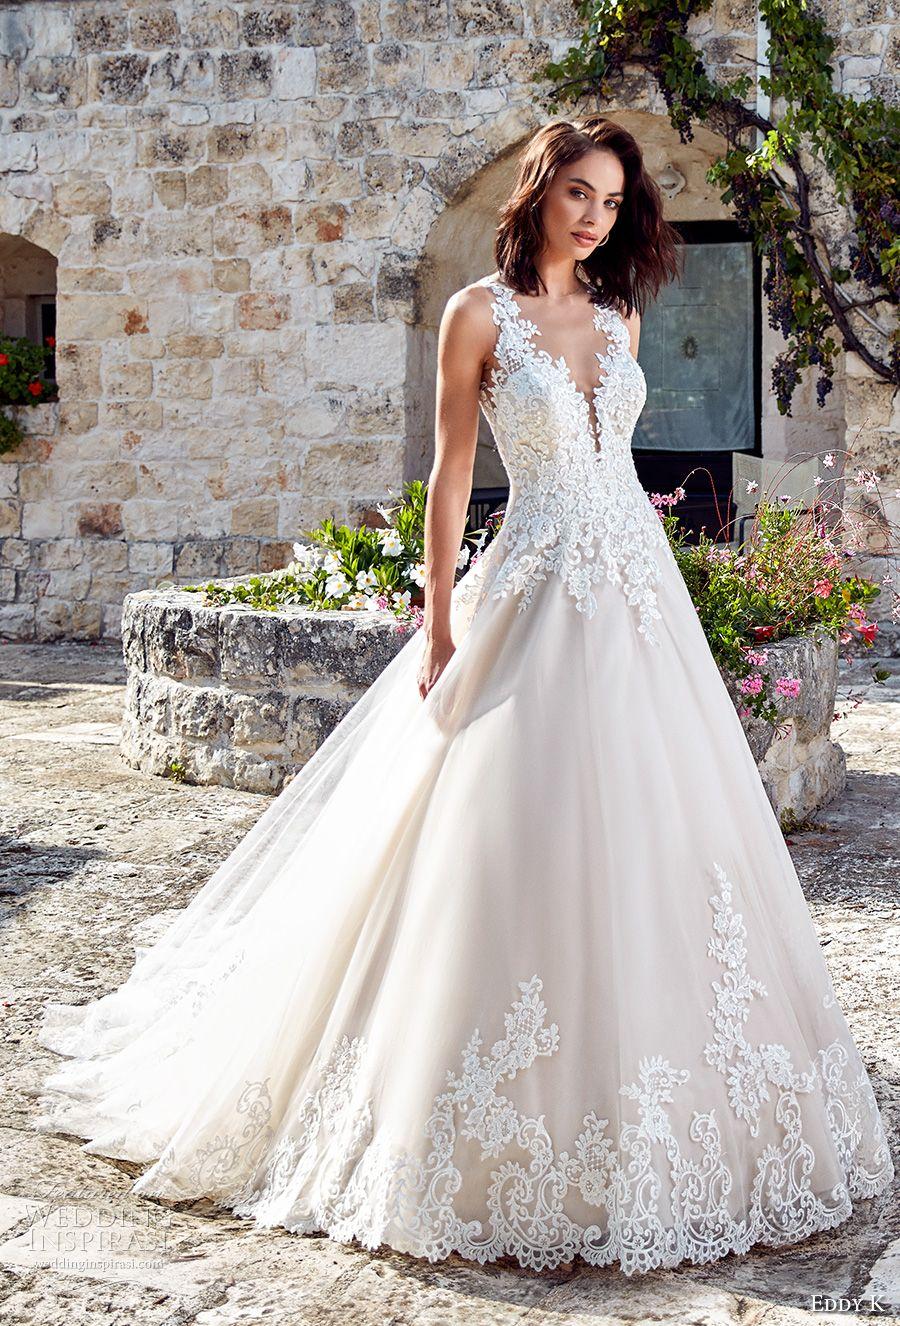 Eddy k dreams wedding dresses chapel train bodice and romantic